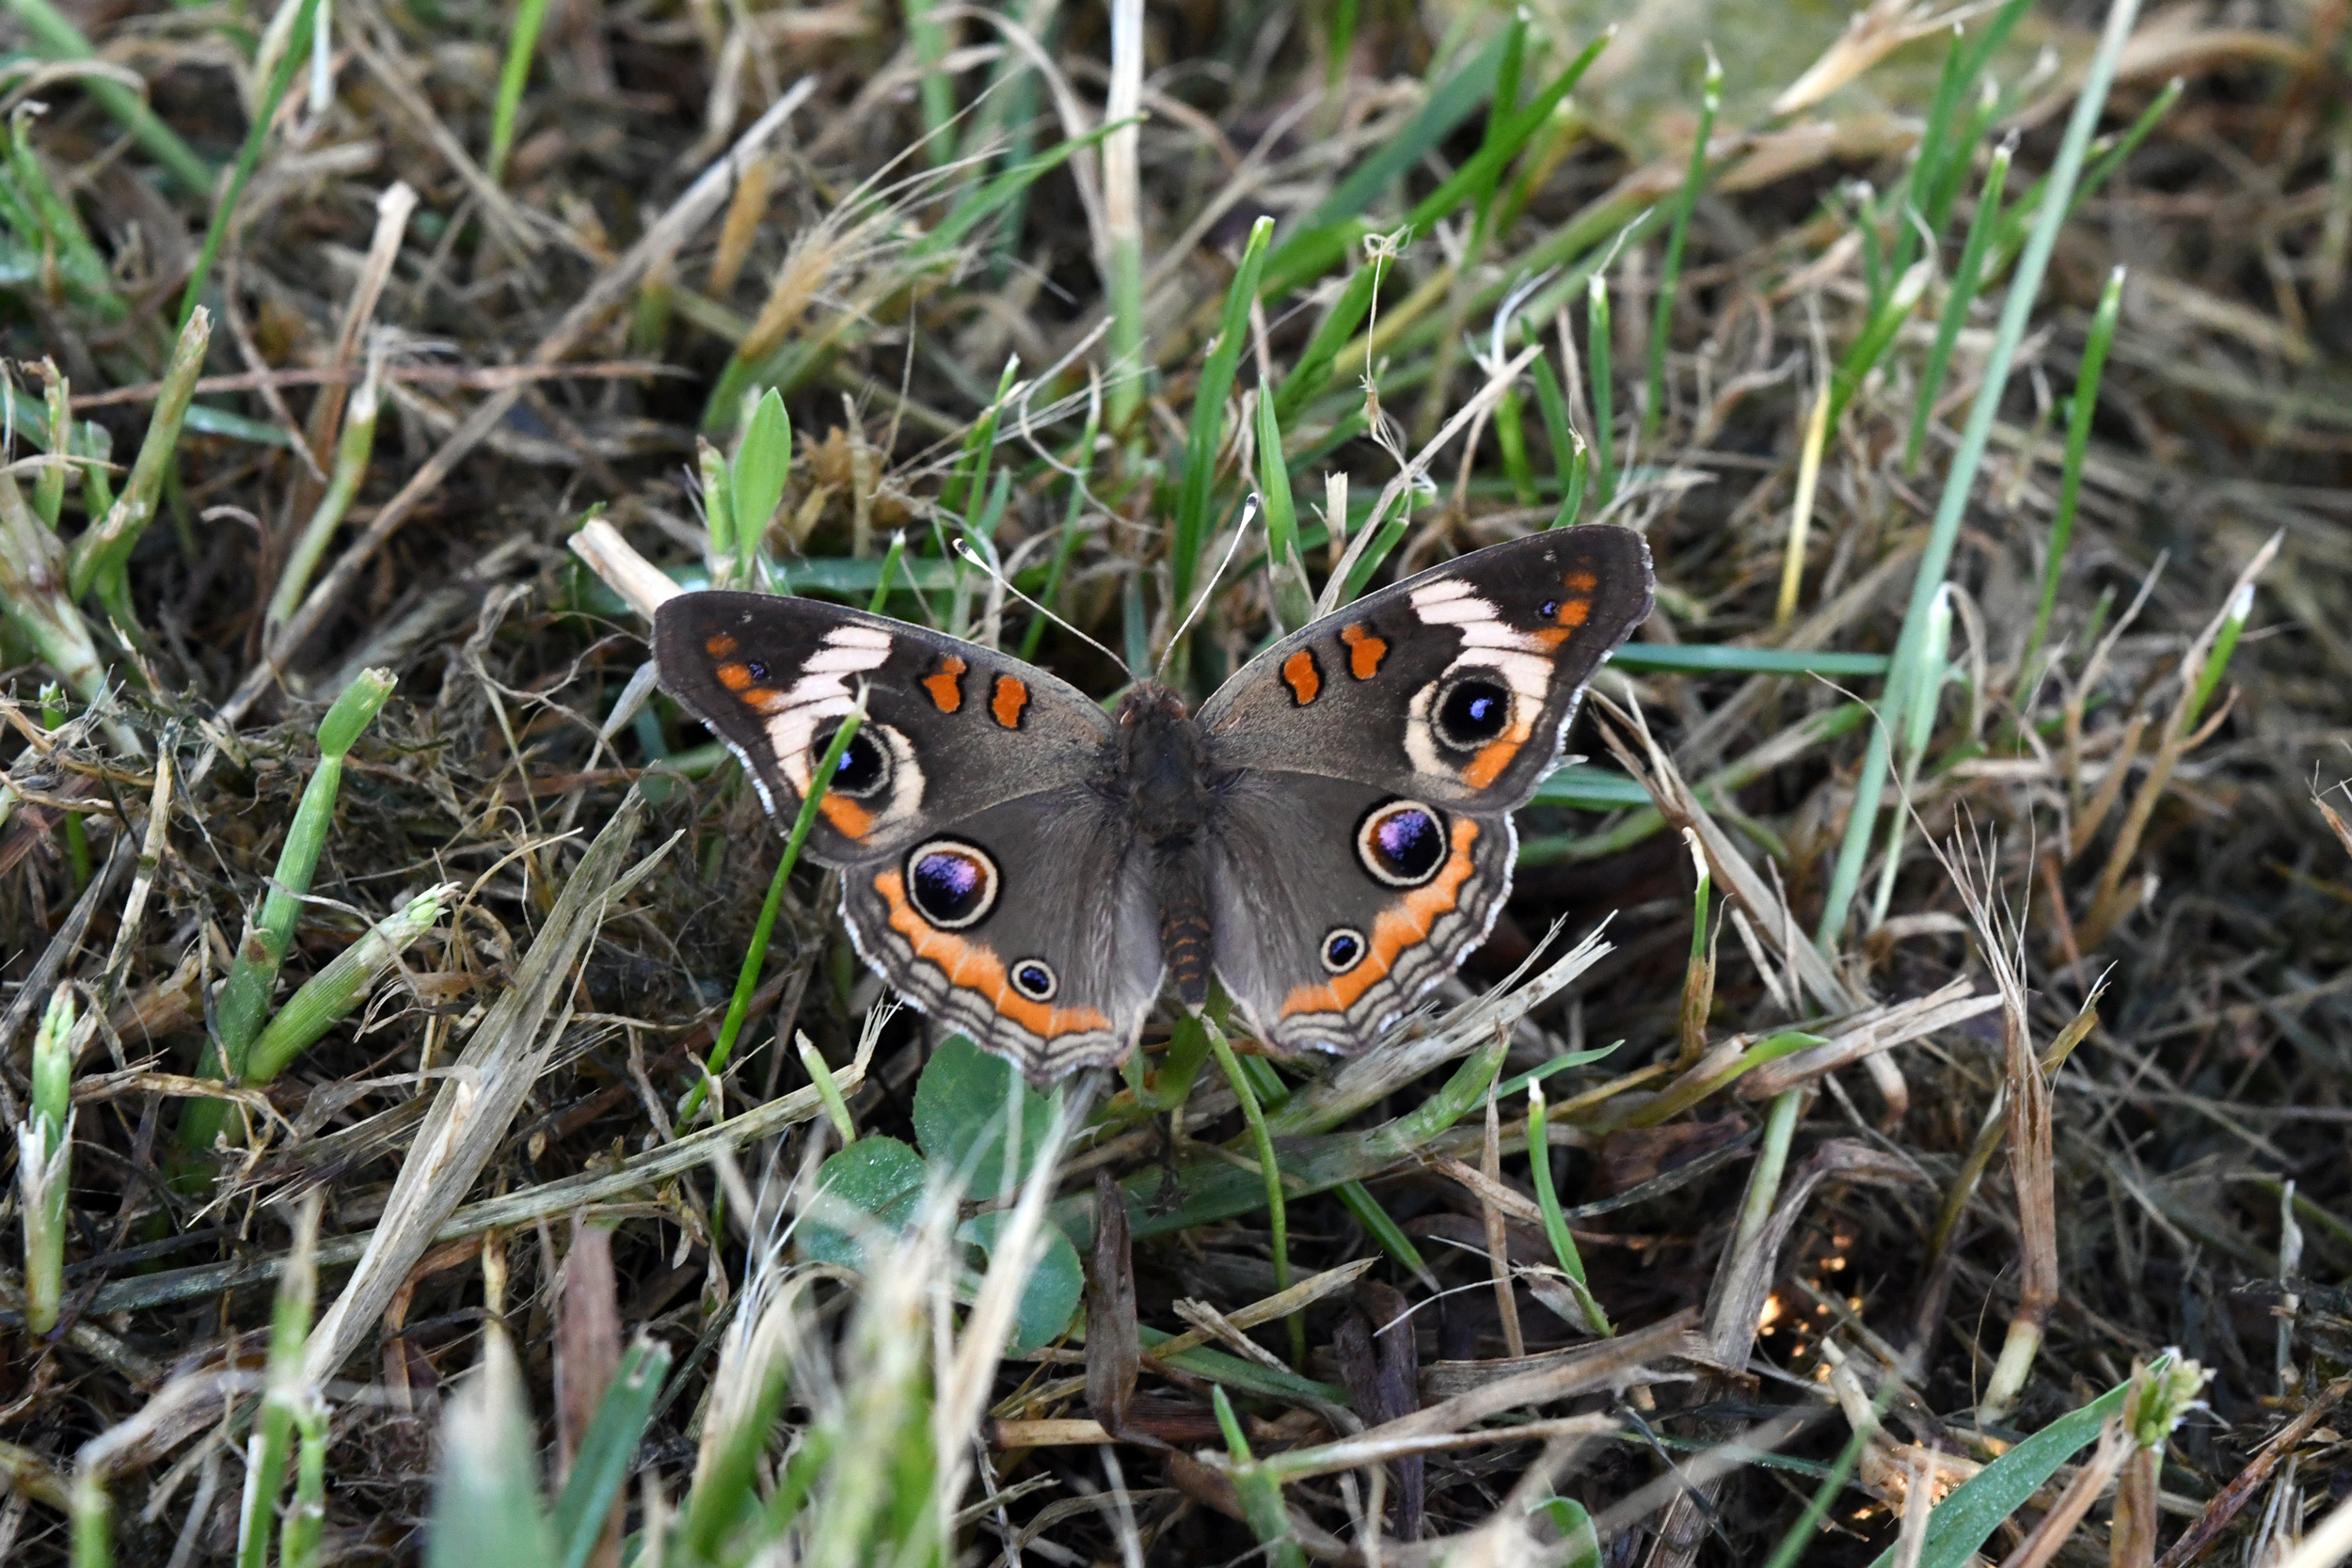 Common buckeye, Prospect Park